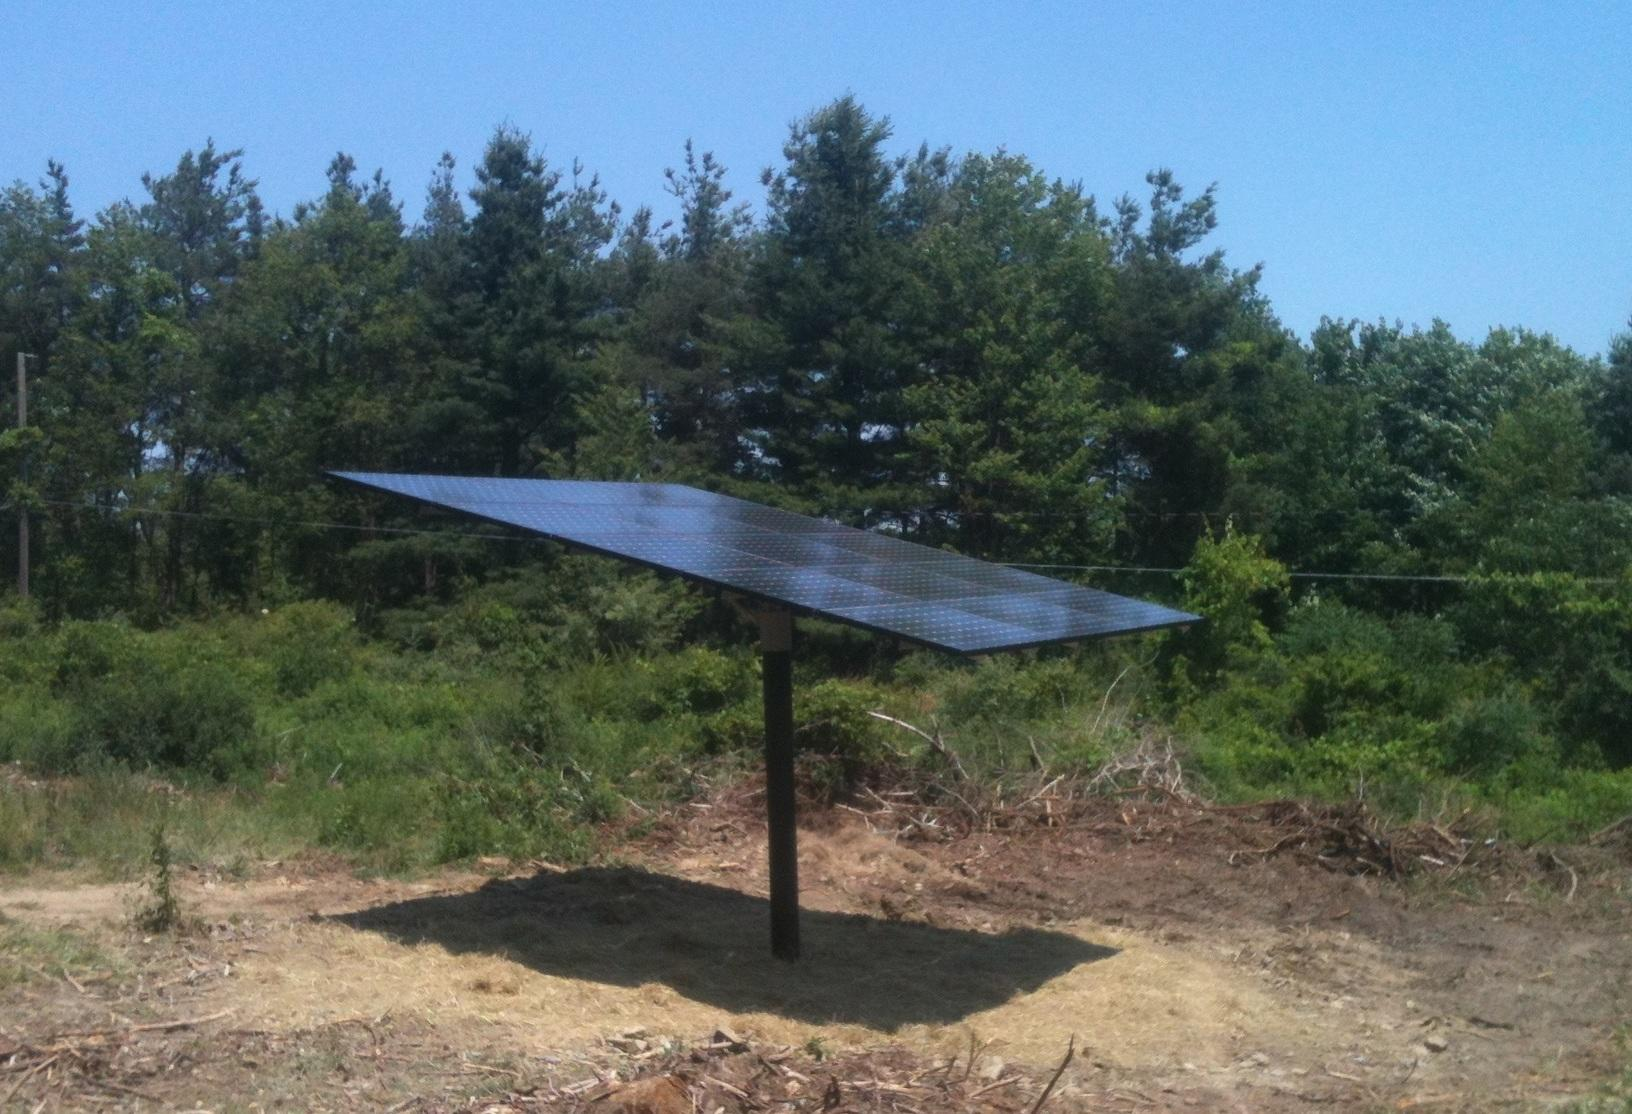 Solar Pole-Mount Installation in Ithaca, NY